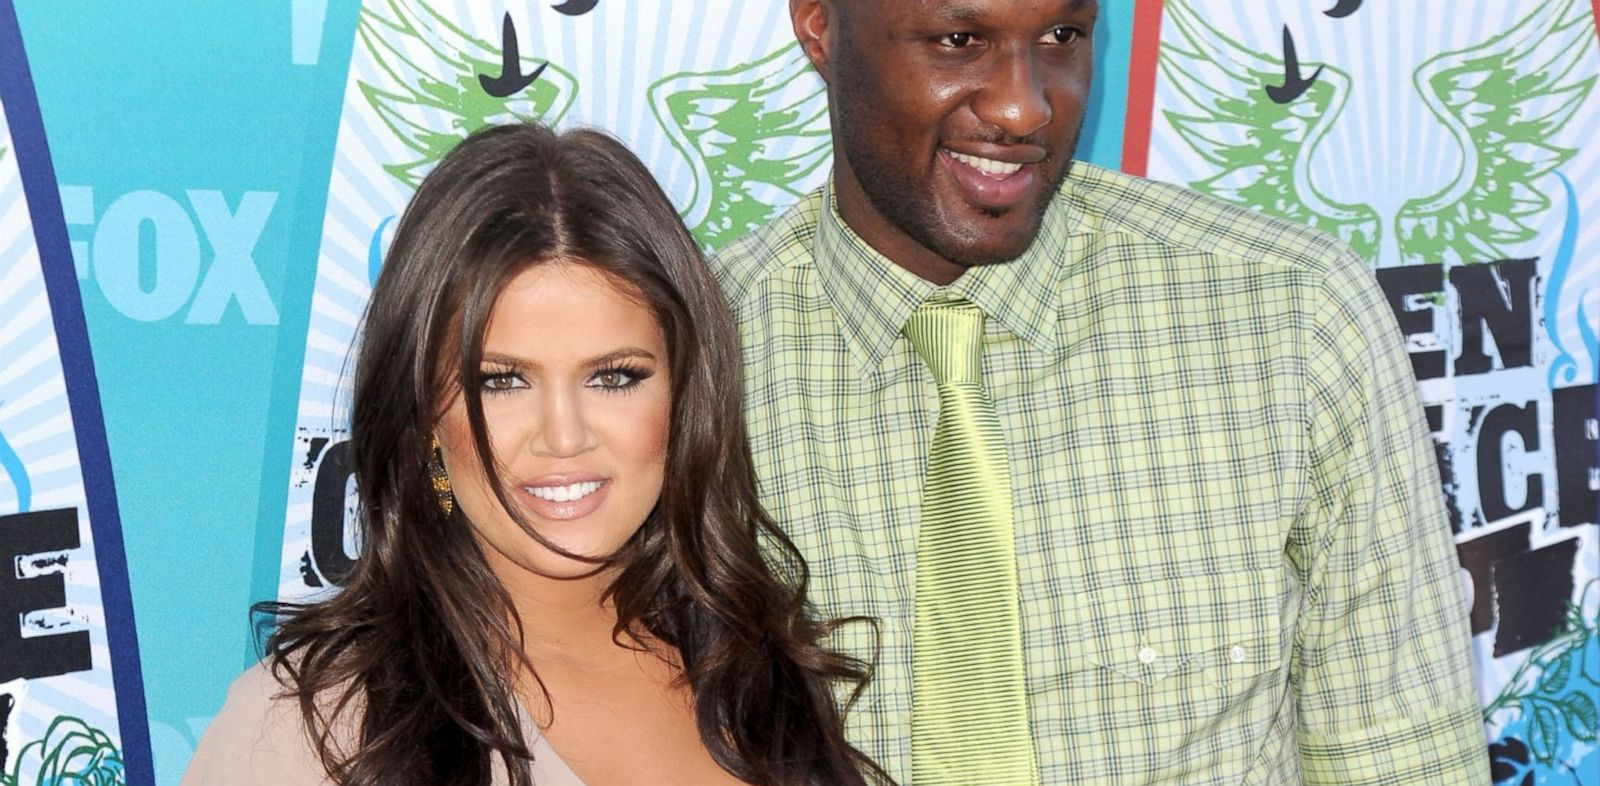 PHOTO: Khloe Kardashian and Lamar Odom